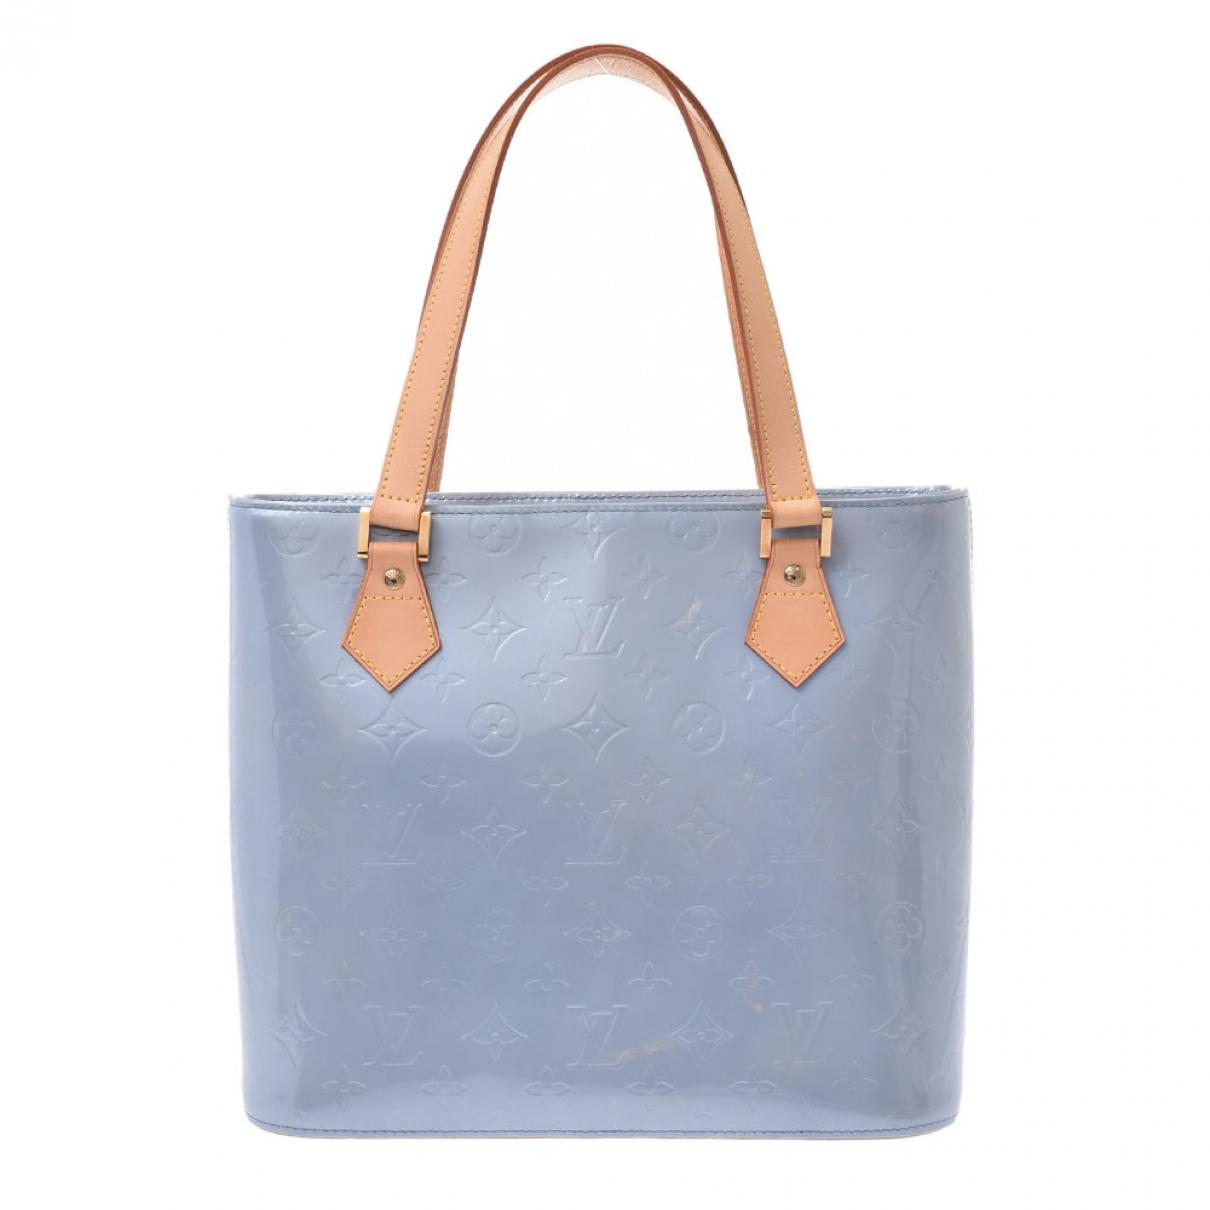 Louis Vuitton Houston Blue Patent leather handbag for Women \N